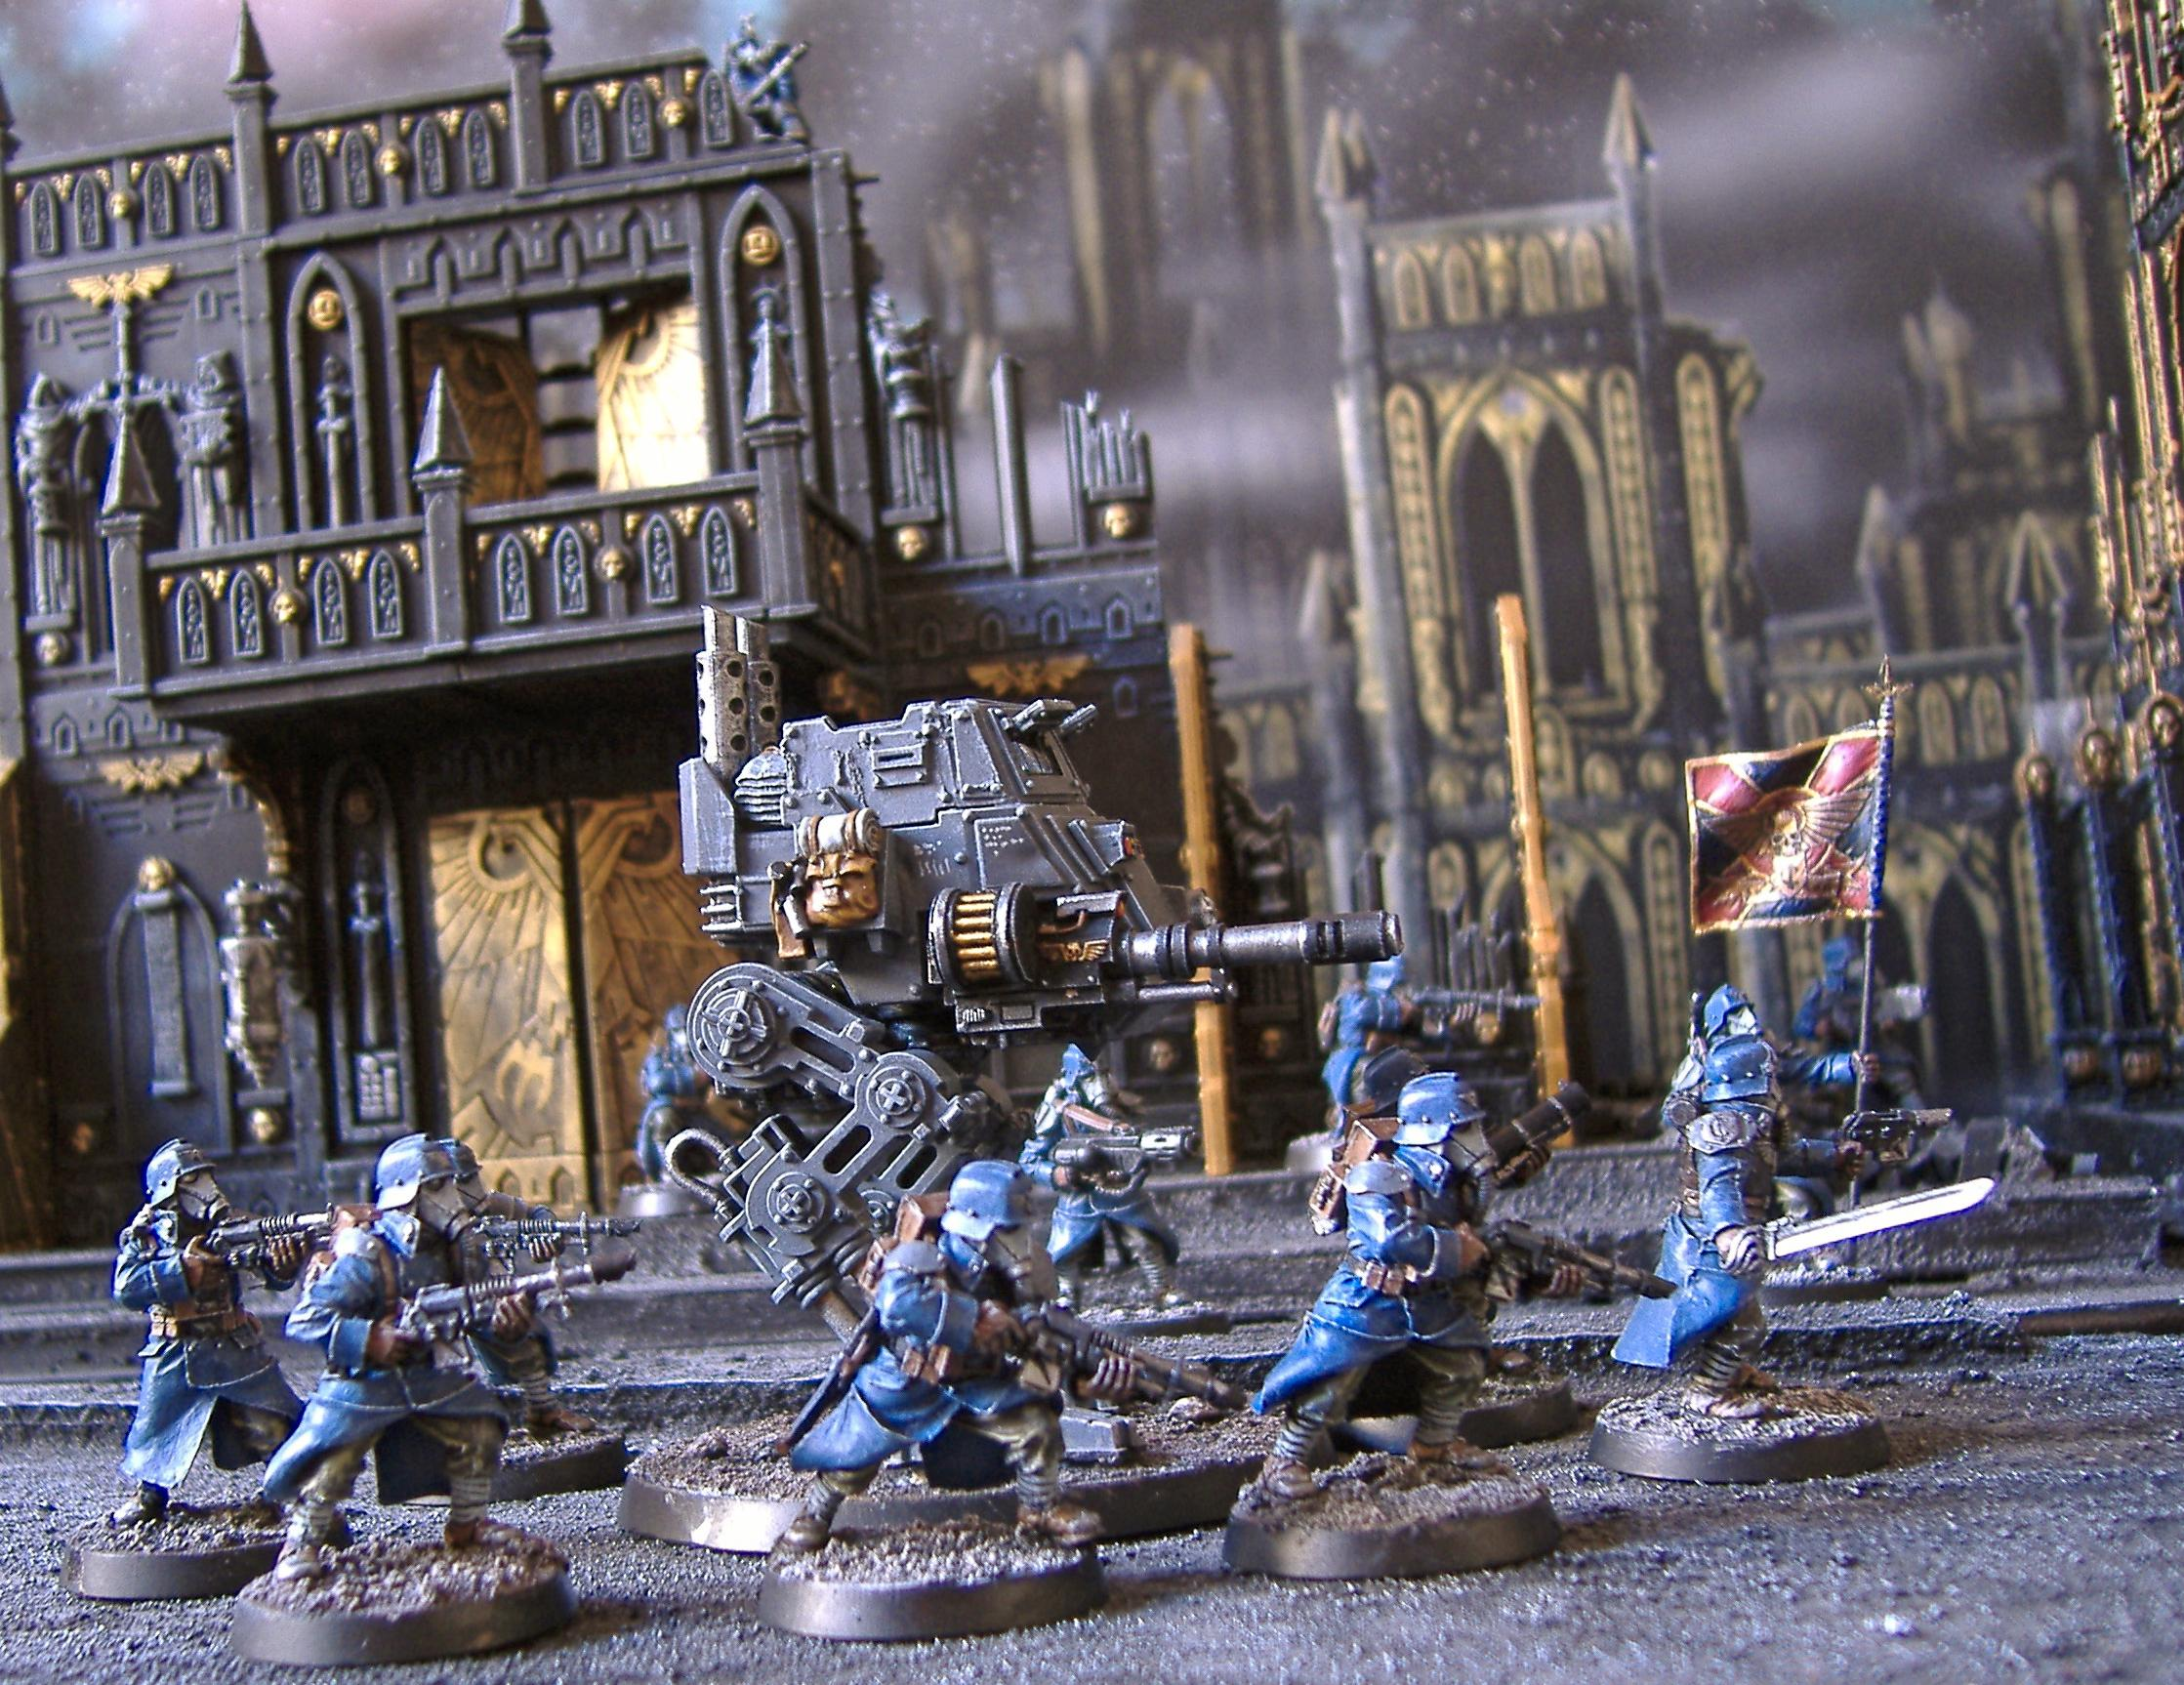 Death, Death Korps of Krieg, Forge World, Guard, Imperial, Imperial Guard, Korps, Sentinel, Terrain, Terrains, Warhammer 40,000